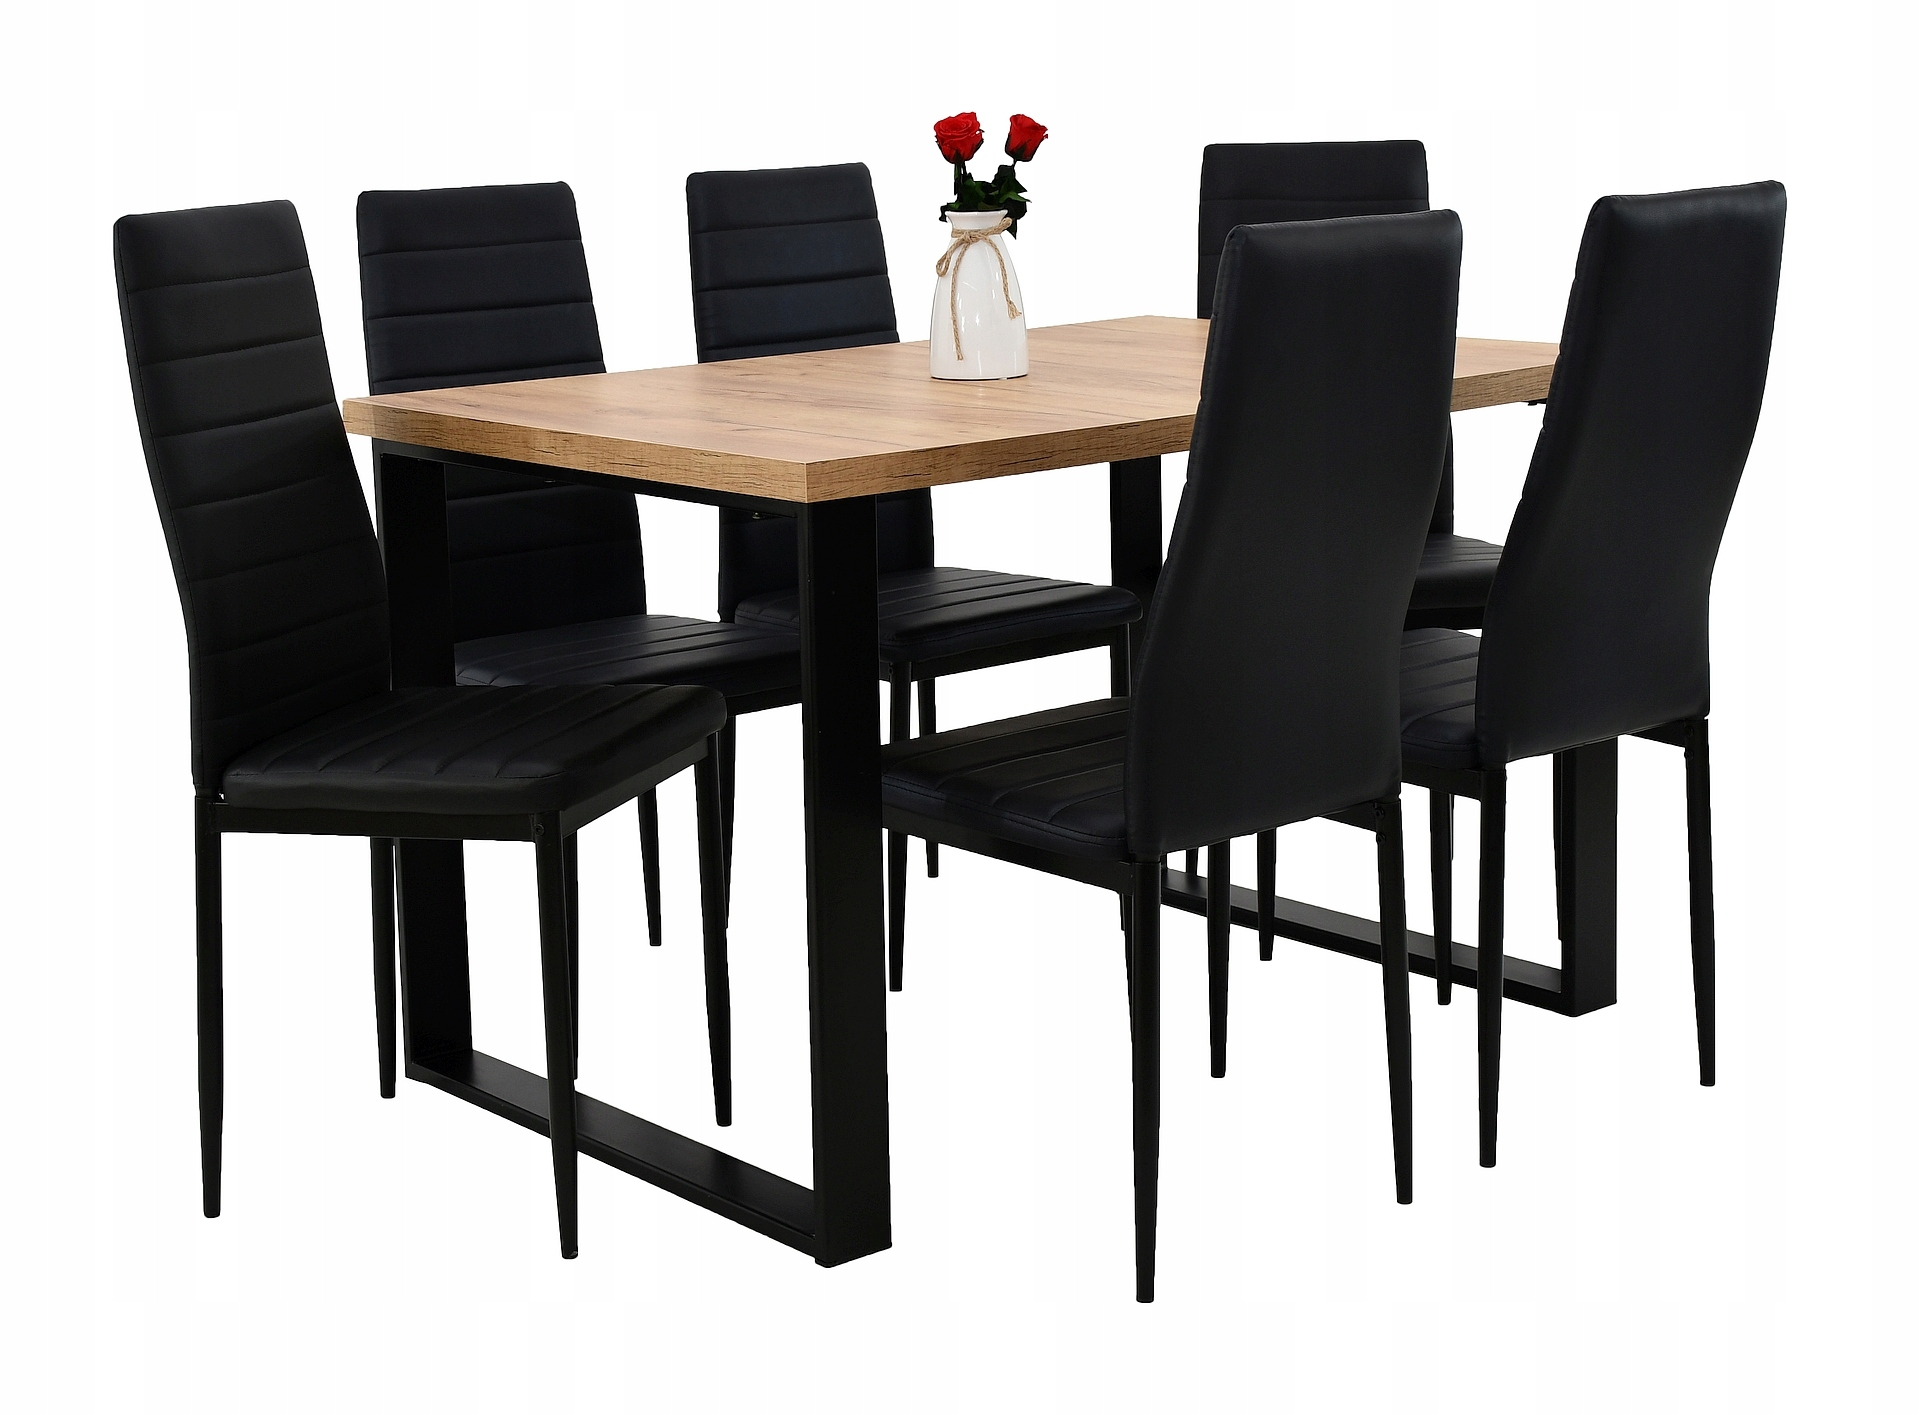 6 stoličkami pre kuchyňu a tabuľku s hard top